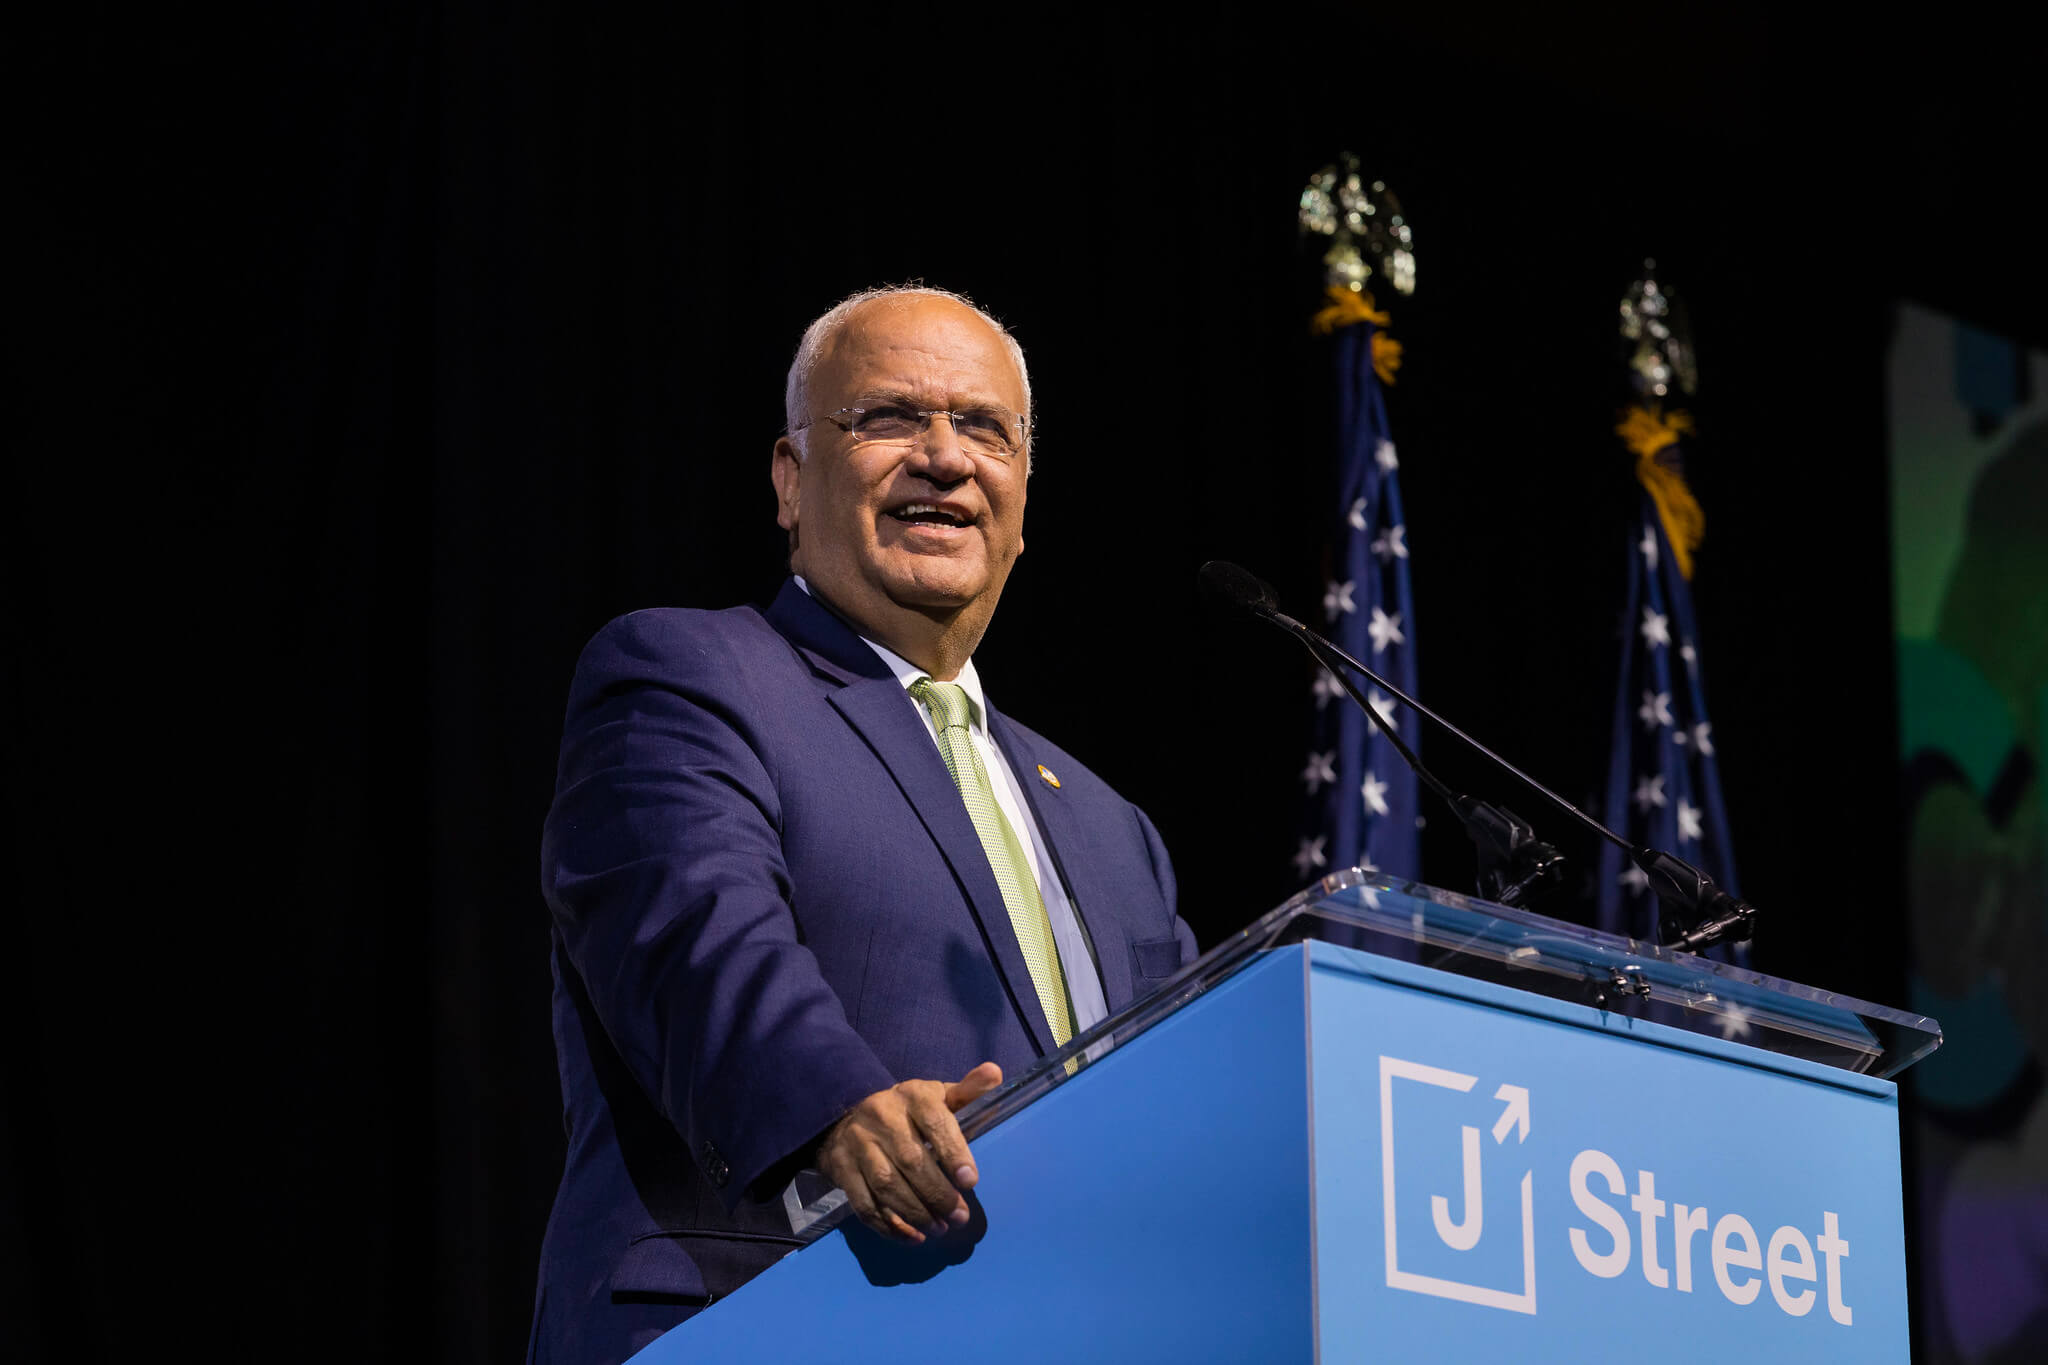 Saeb Erakat speaks to J Street's 2019 National Conference. (Photo: J Street)